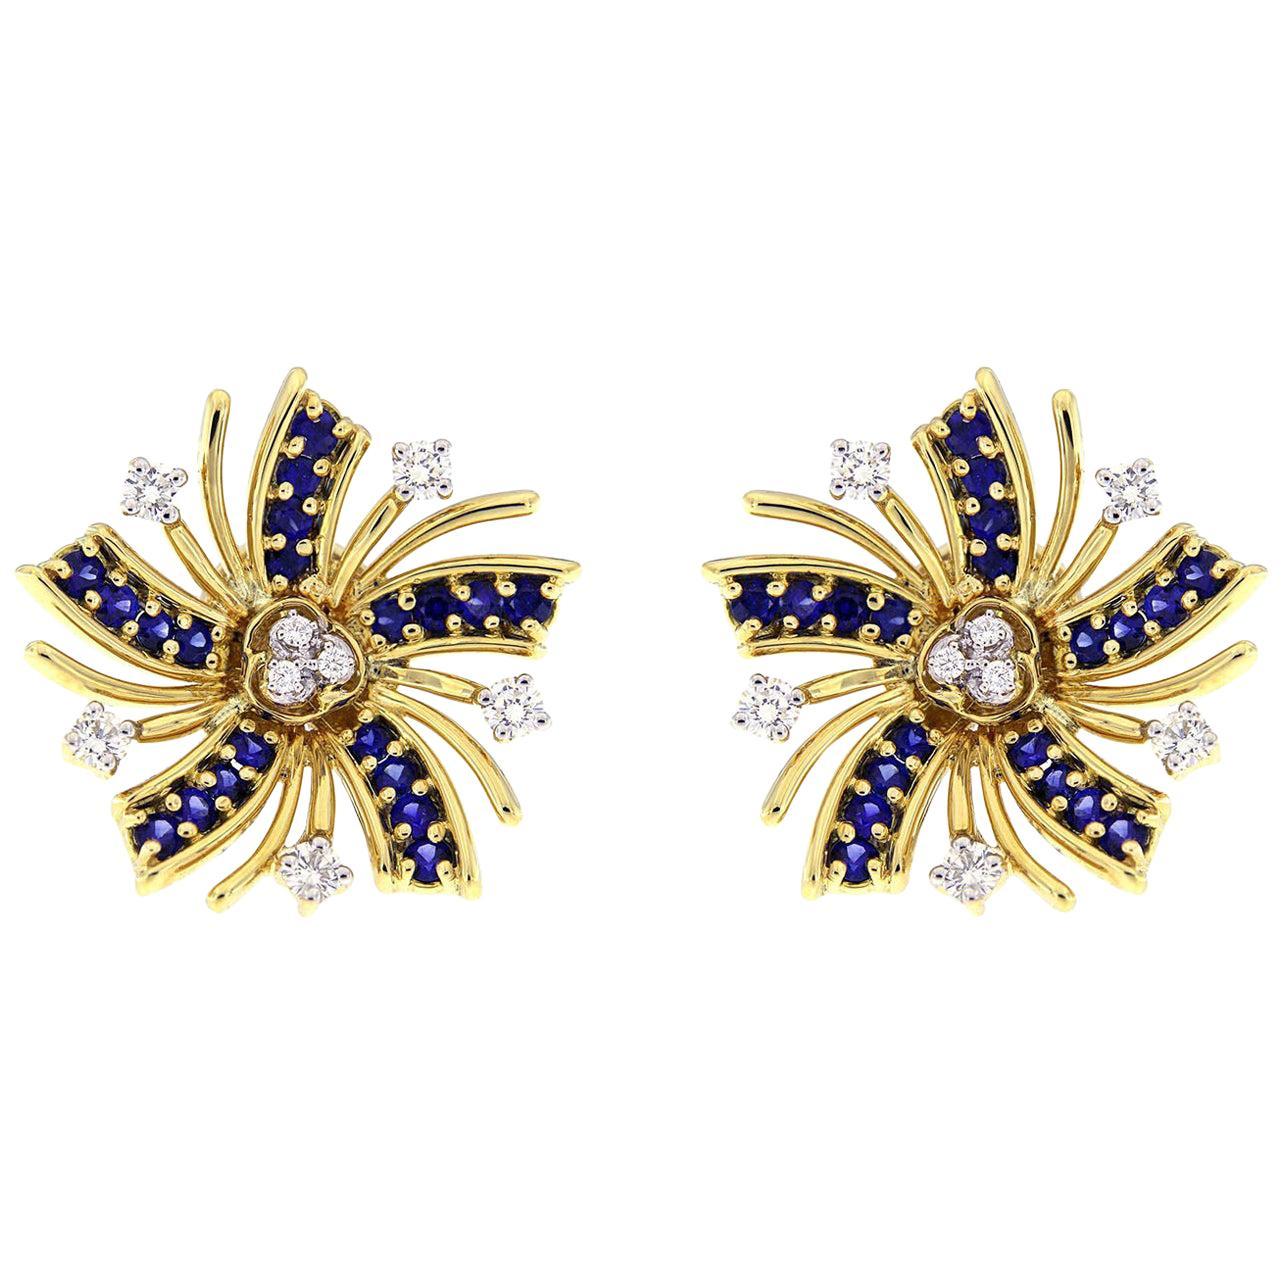 Valentin Magro Viva el Sol Diamond Sapphire Earrings